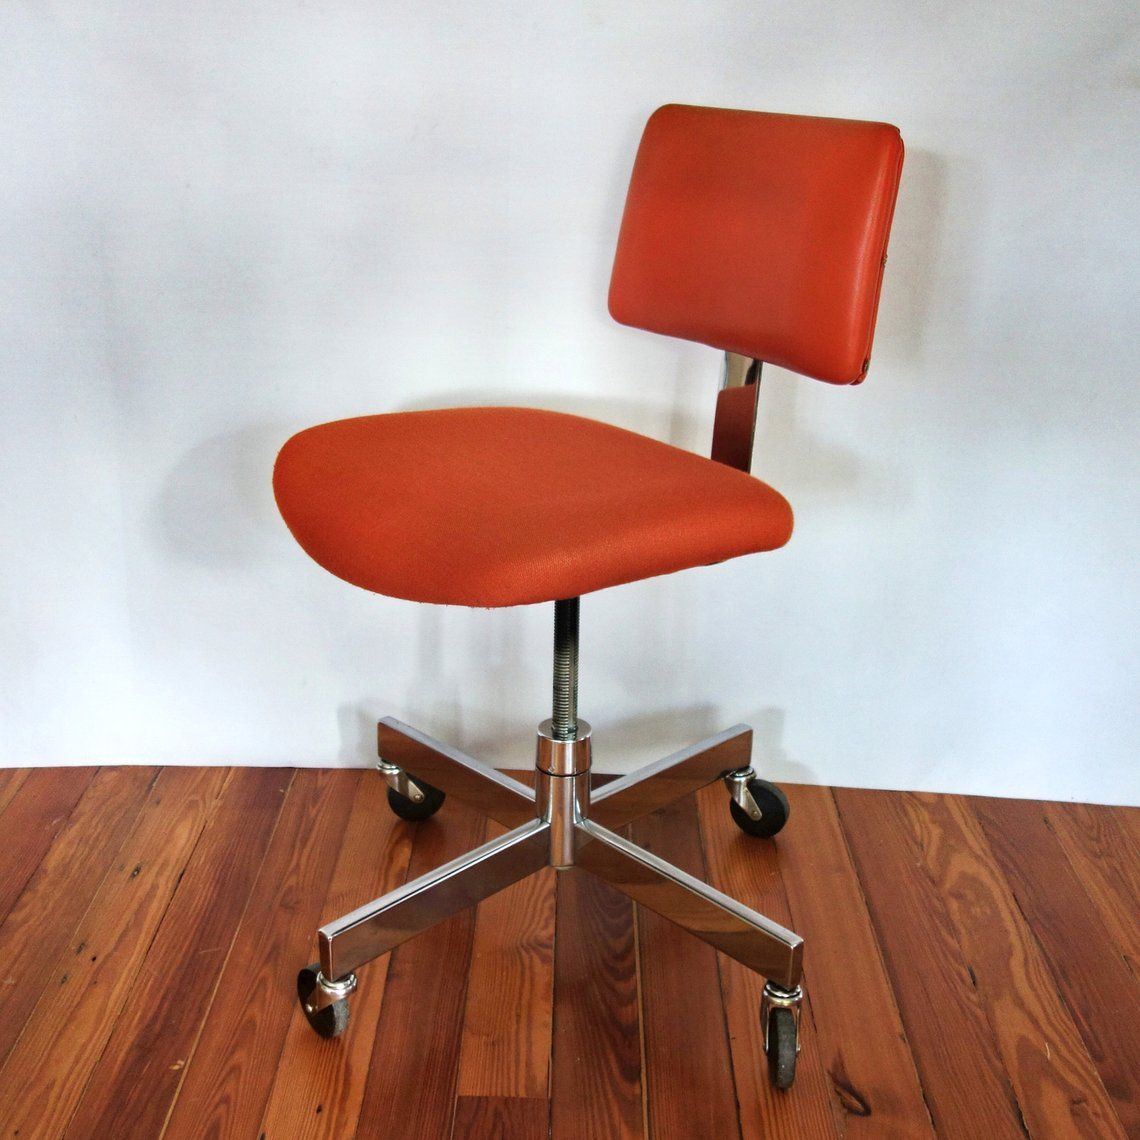 Steelcase Office Chair Mid Century Orange Desk Chair Vintage Vintage Desk Chair Orange Office Chairs Retro Office Chair